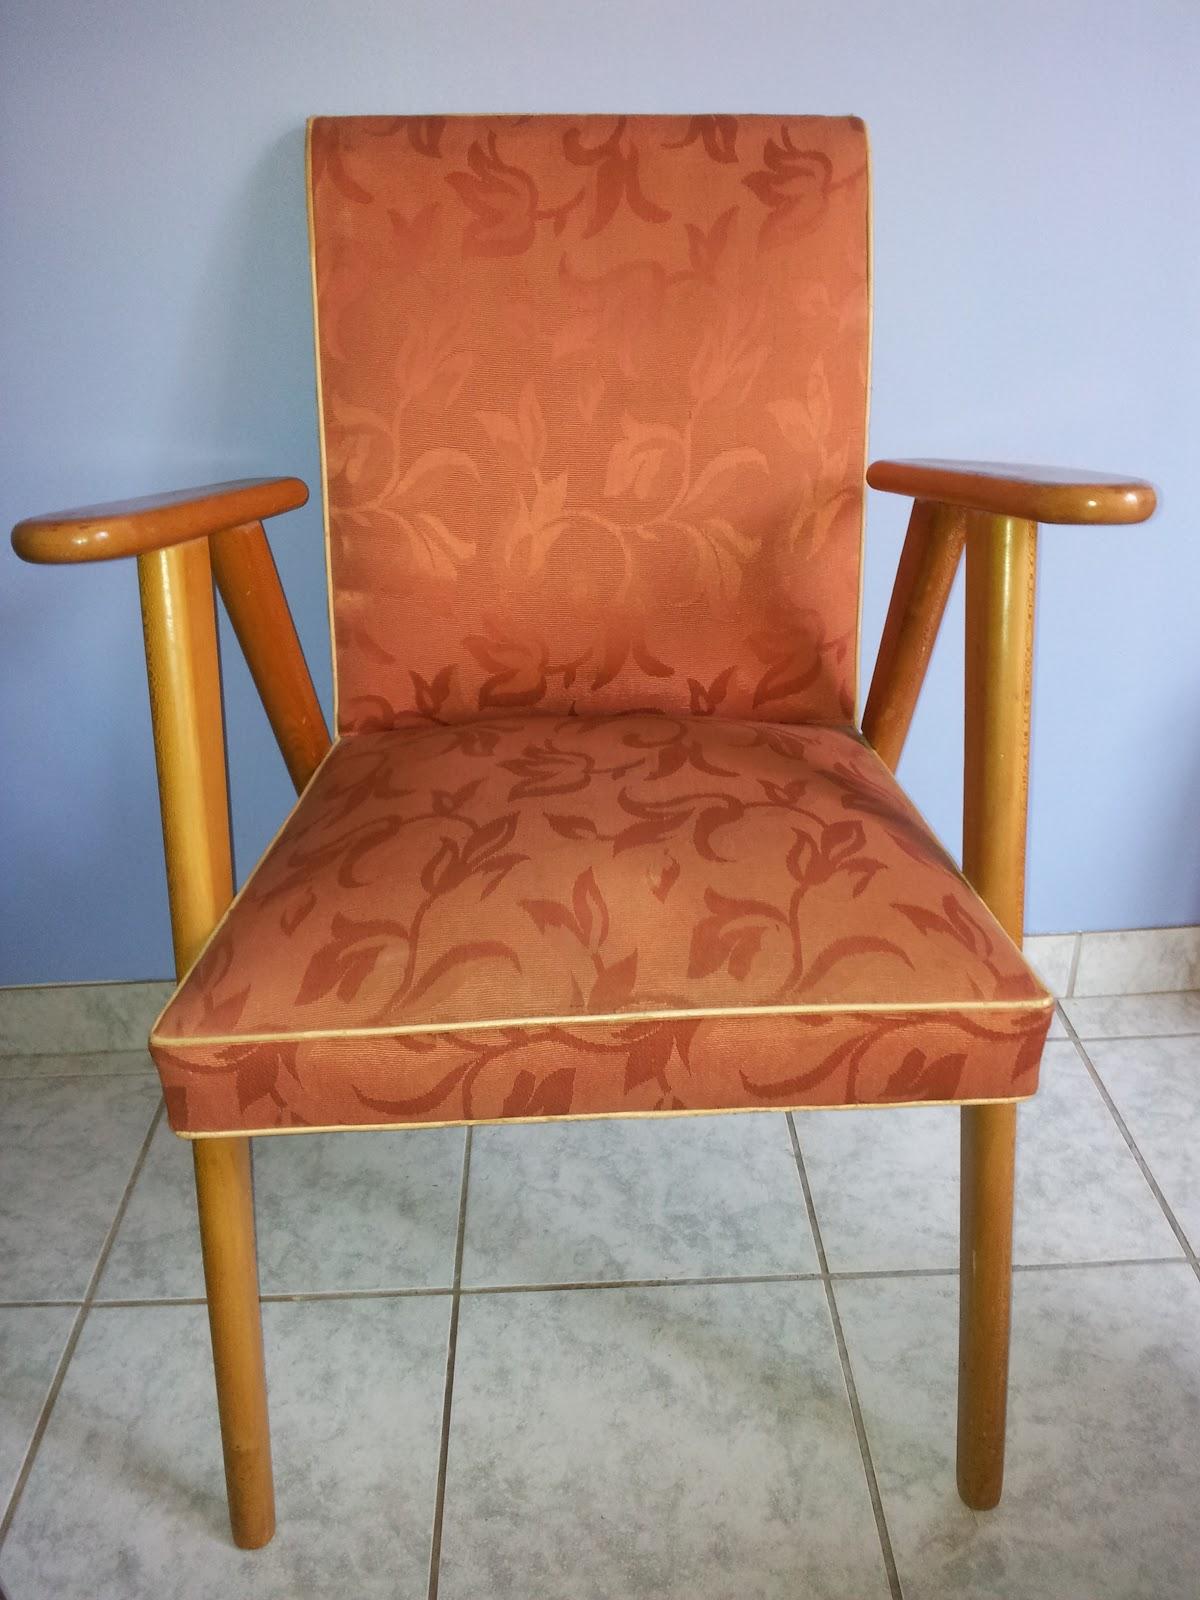 troc and broc fauteuils style bridge art deco. Black Bedroom Furniture Sets. Home Design Ideas